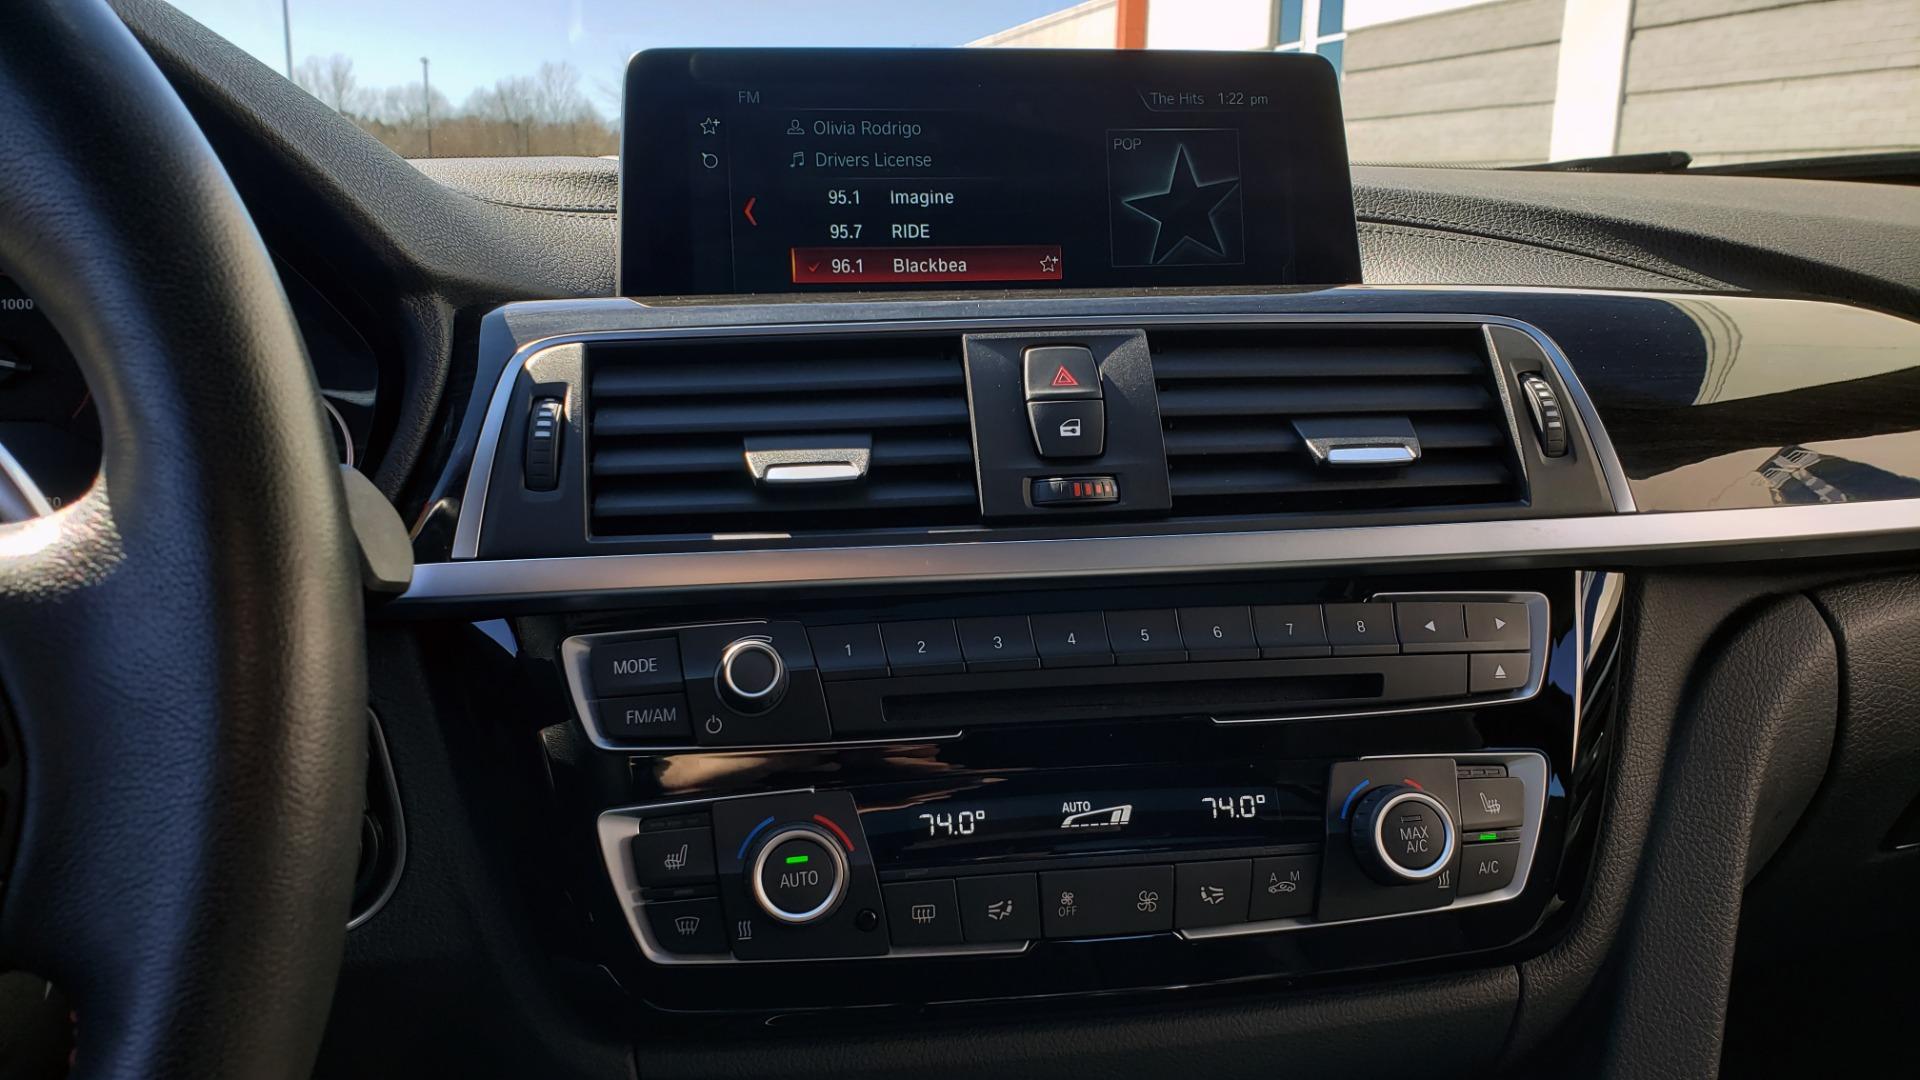 Used 2018 BMW 4 SERIES 430IXDRIVE / PREMIUM / NAV / SUNROOF / ESSENTIALS PKG for sale $29,495 at Formula Imports in Charlotte NC 28227 41